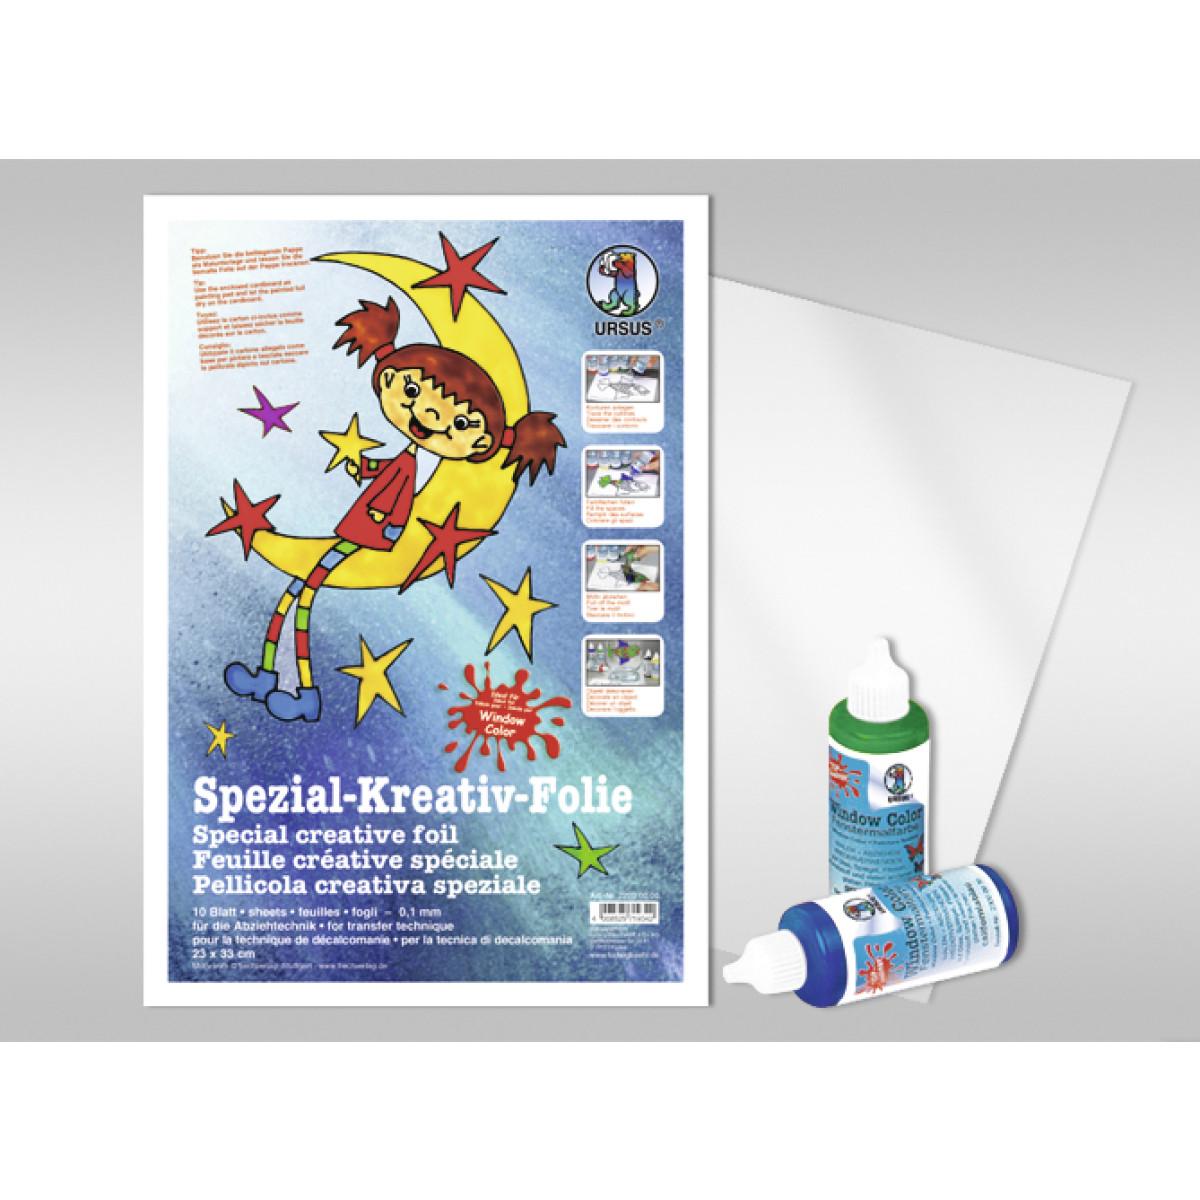 Spezial-Kreativ-Folie 23 x 33 cm - 10 Blatt